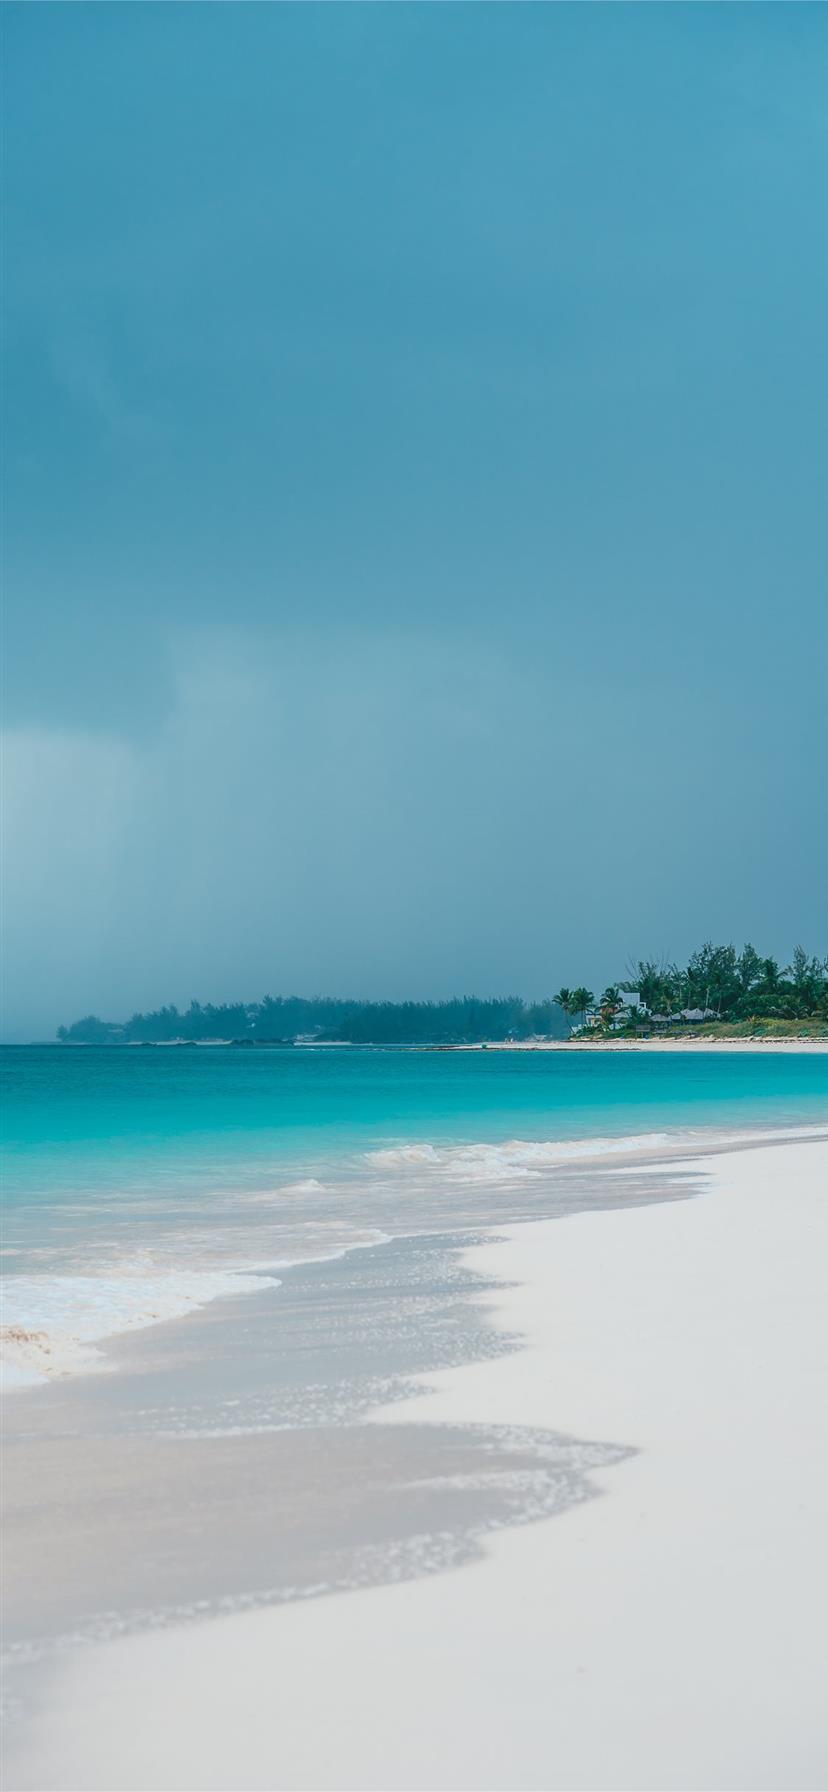 Eleuthera Bahamas Iphone 11 Wallpapers Free Download